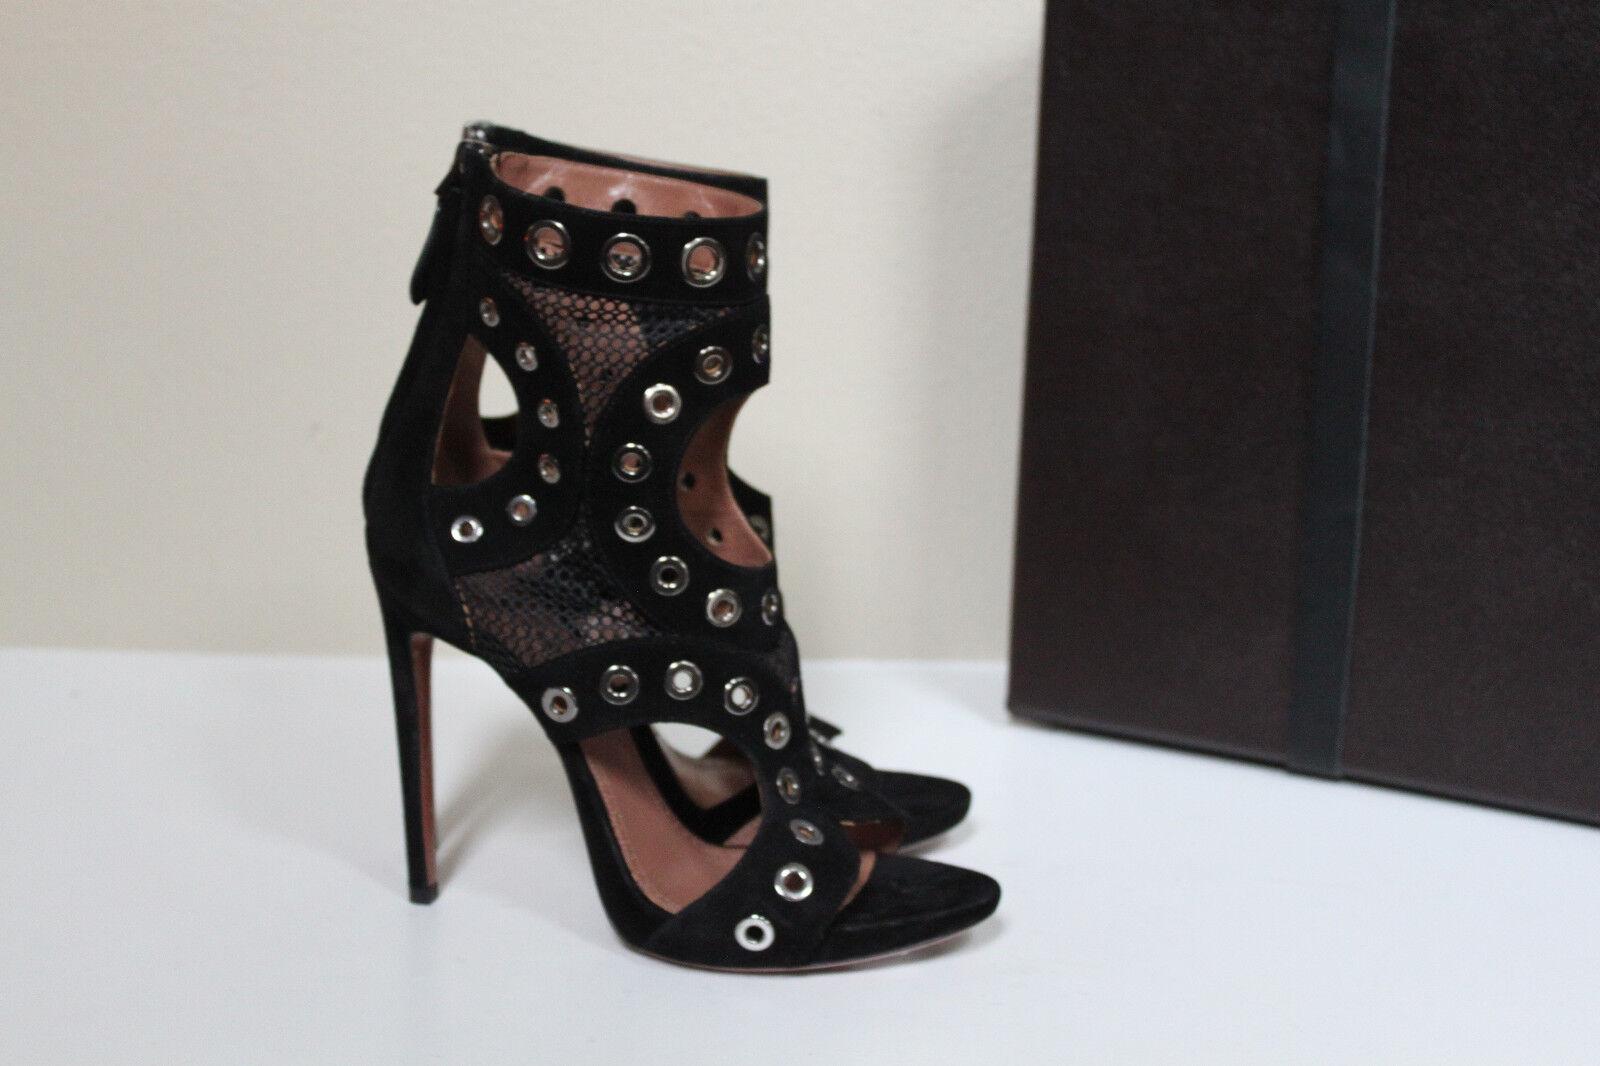 New sz 8.5 US US 8.5 / 38.5 Azzedine Alaia Black Suede Open Toe Ankle Sandal Heel Shoes e60bd9